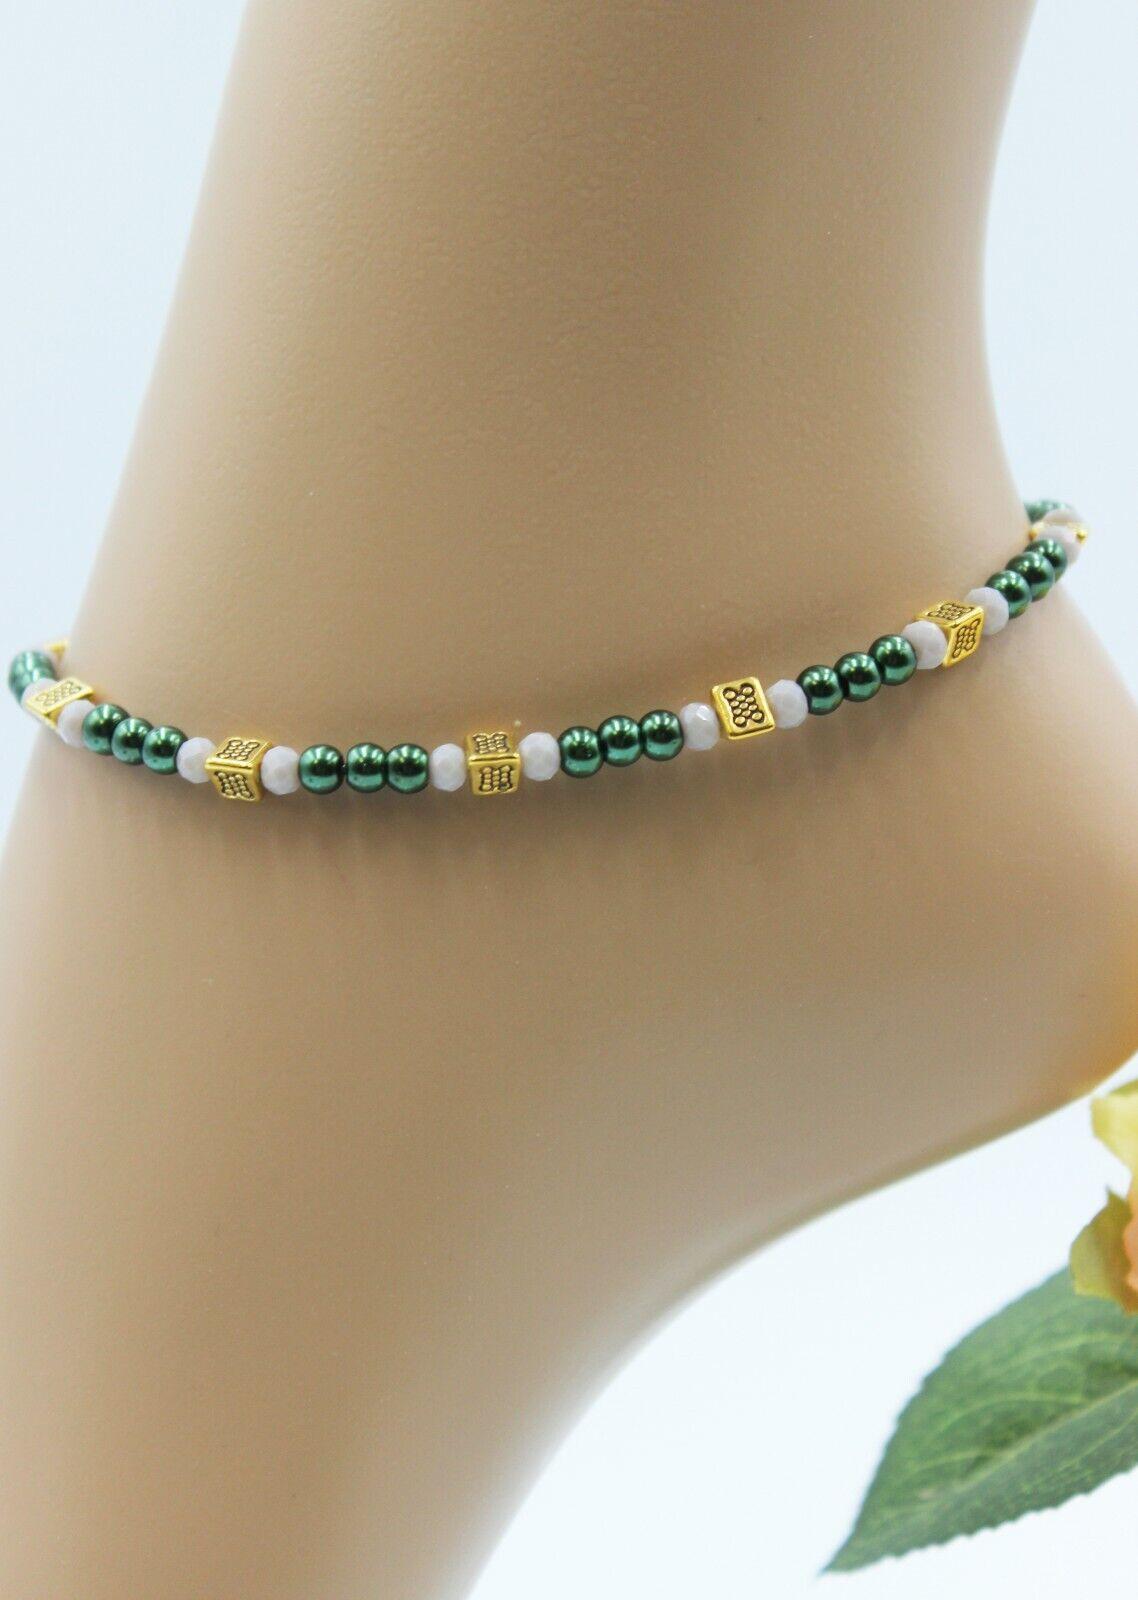 Glass Stone Jewellery XL Gold Anklet Chain Green Black Boho Hippie Elegant #K080